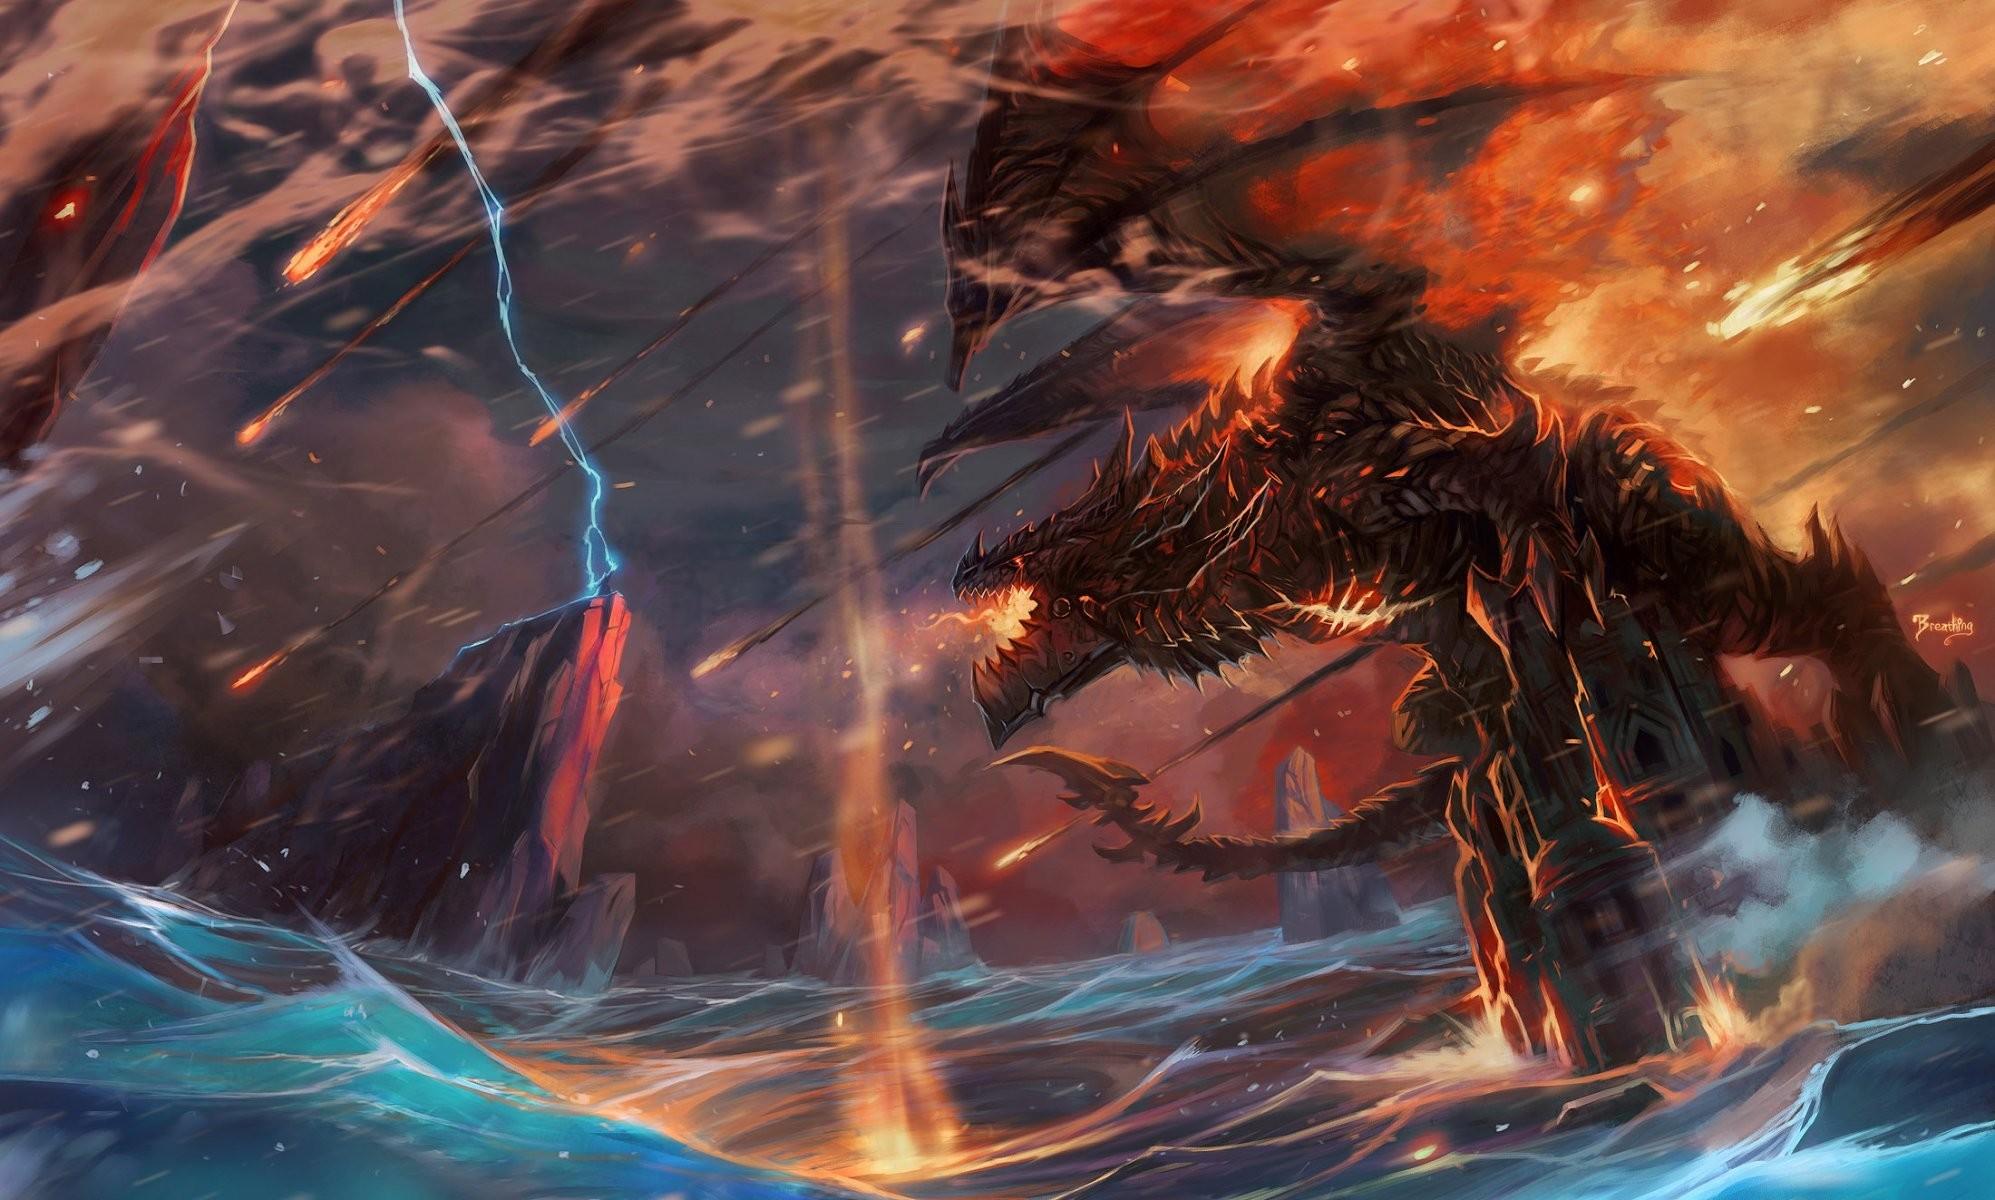 Black-Lightning-Dragon-Wallpaper – art-jian-guo-world-of-warcraft-dragon -man-lightning-castle-waves-fire